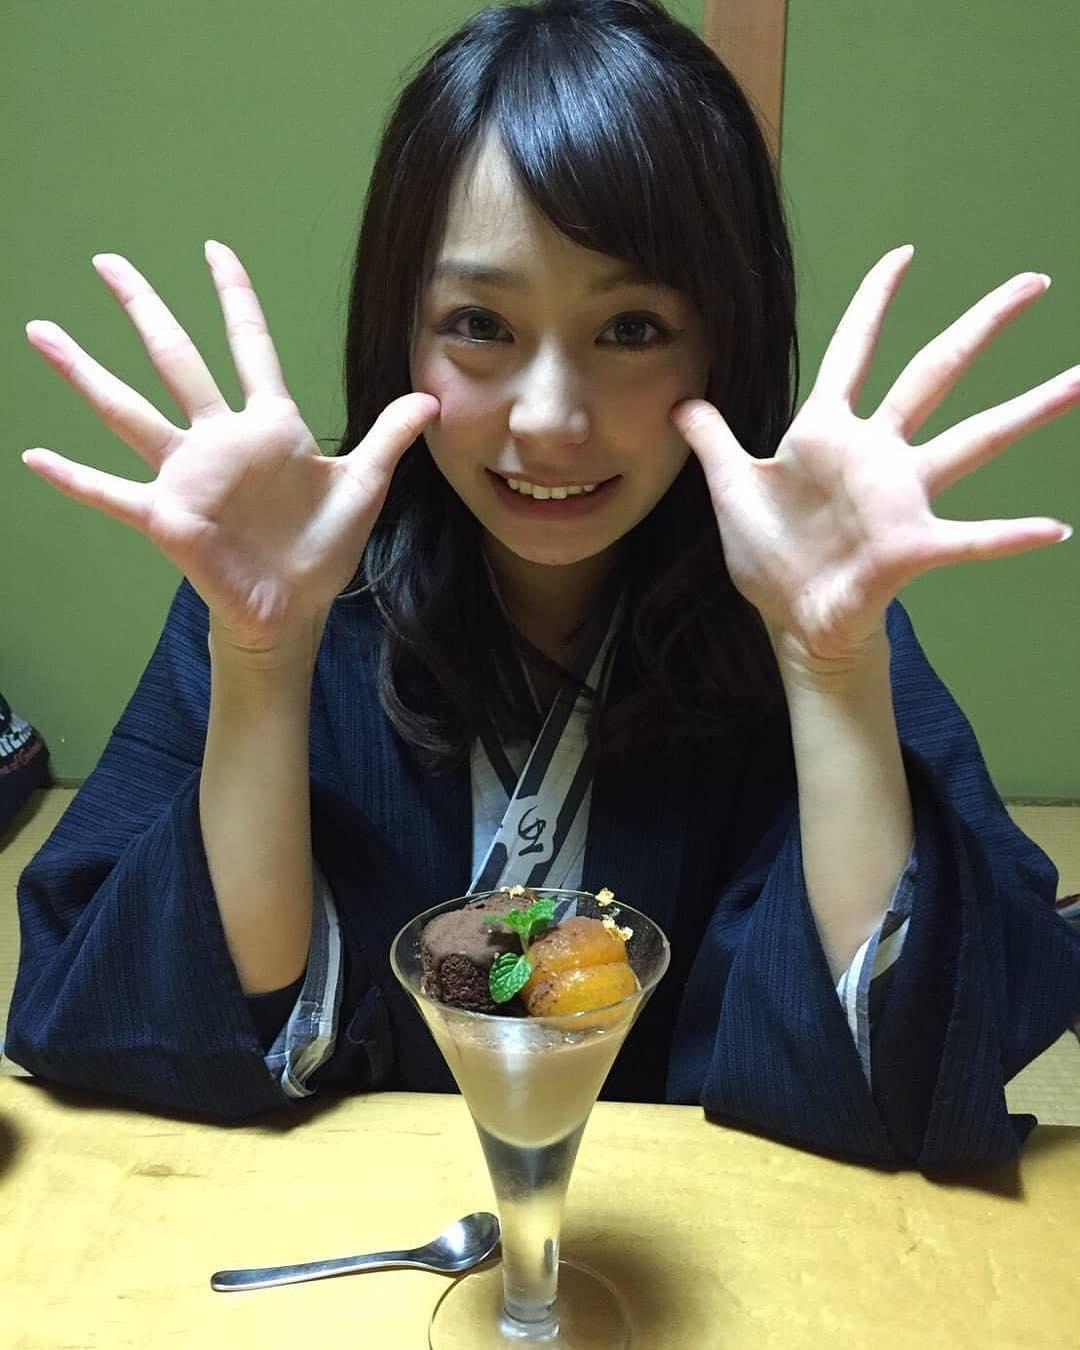 ugaki_misato105.jpg